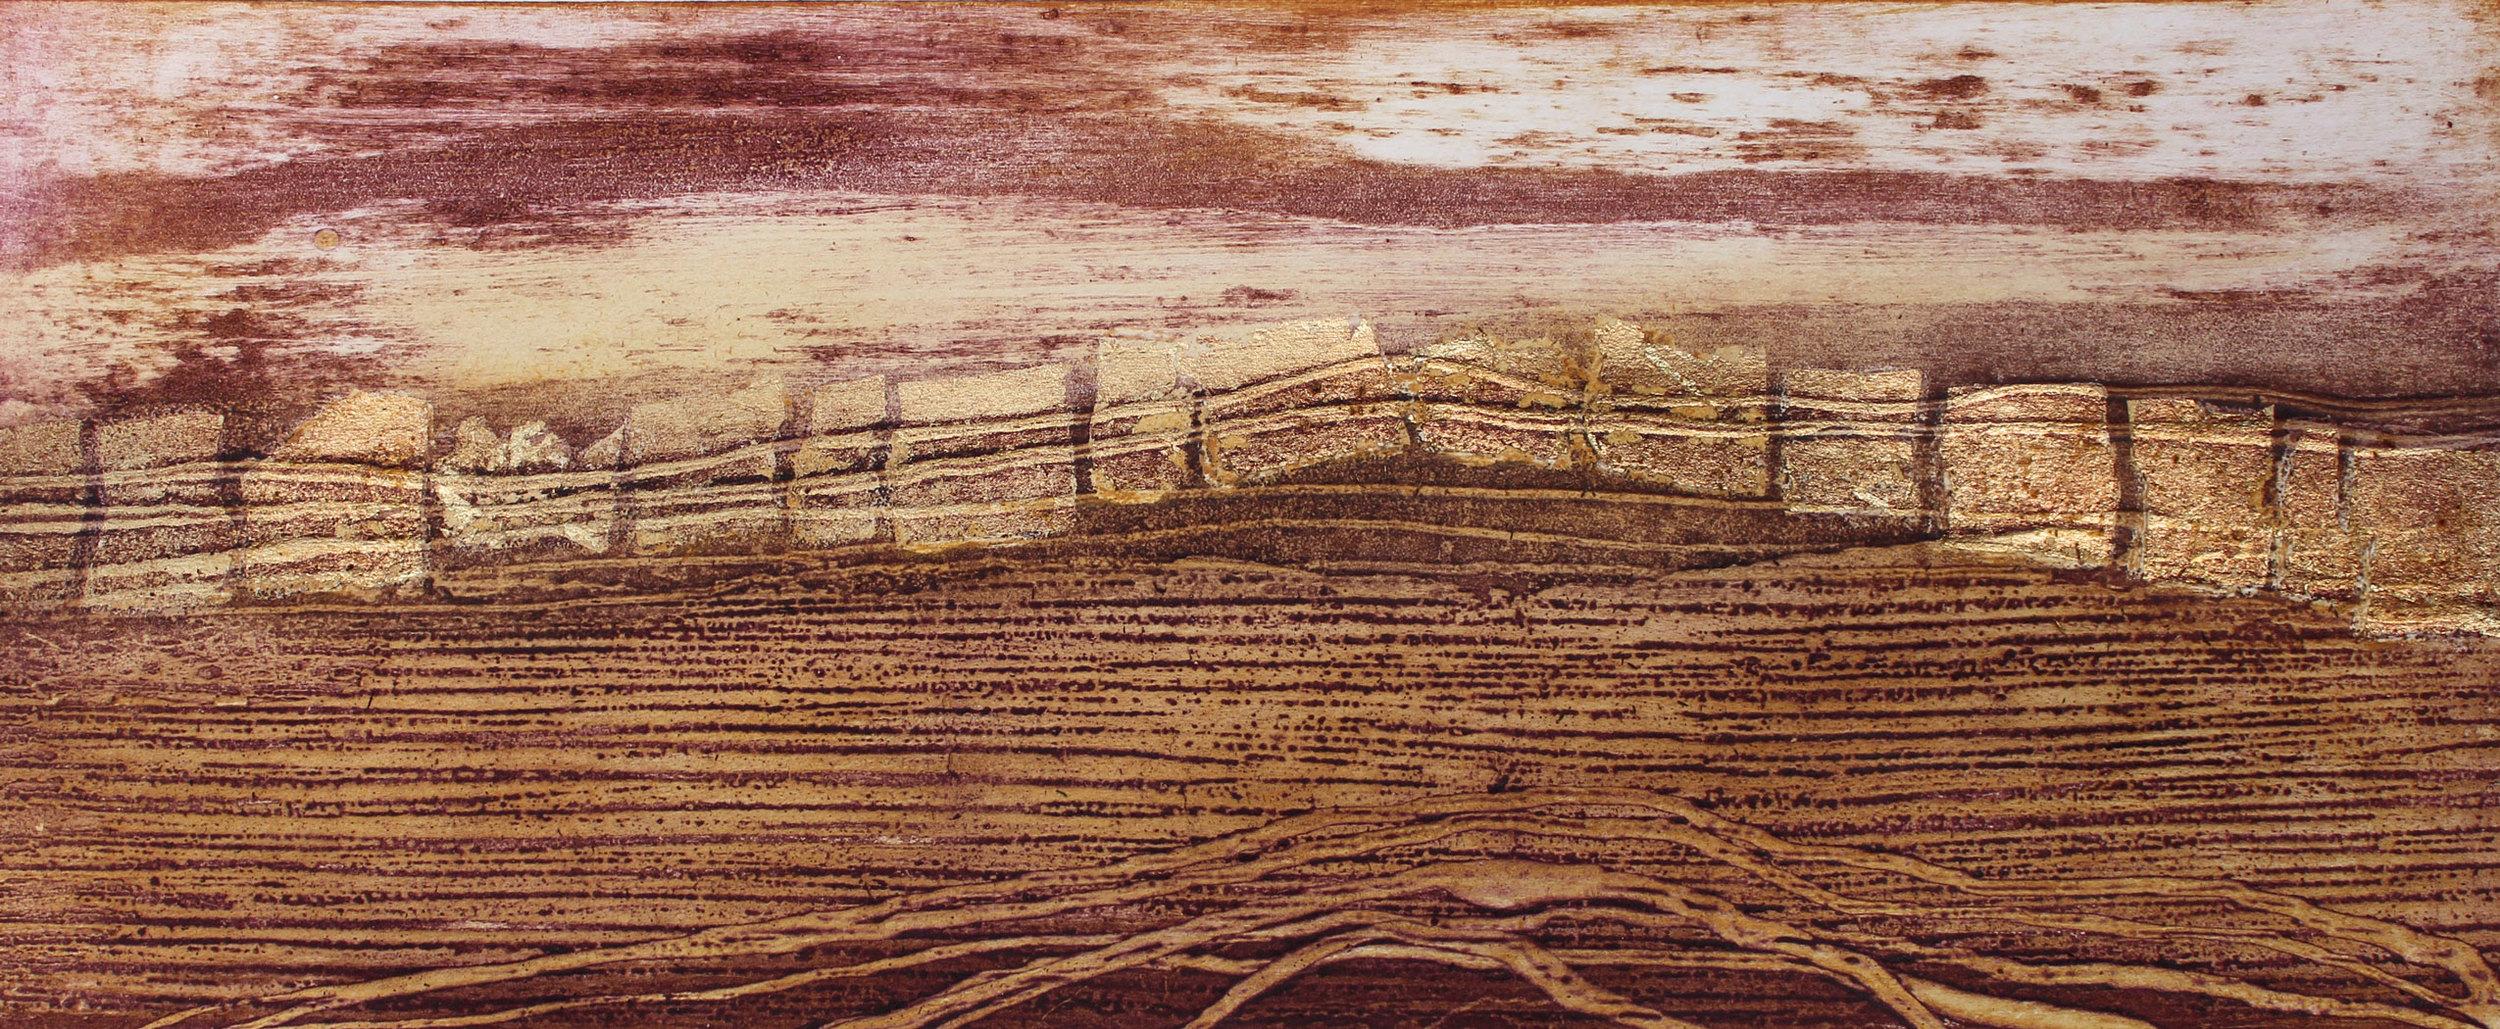 Sundown   collagraph    22 x 52 cm    £220